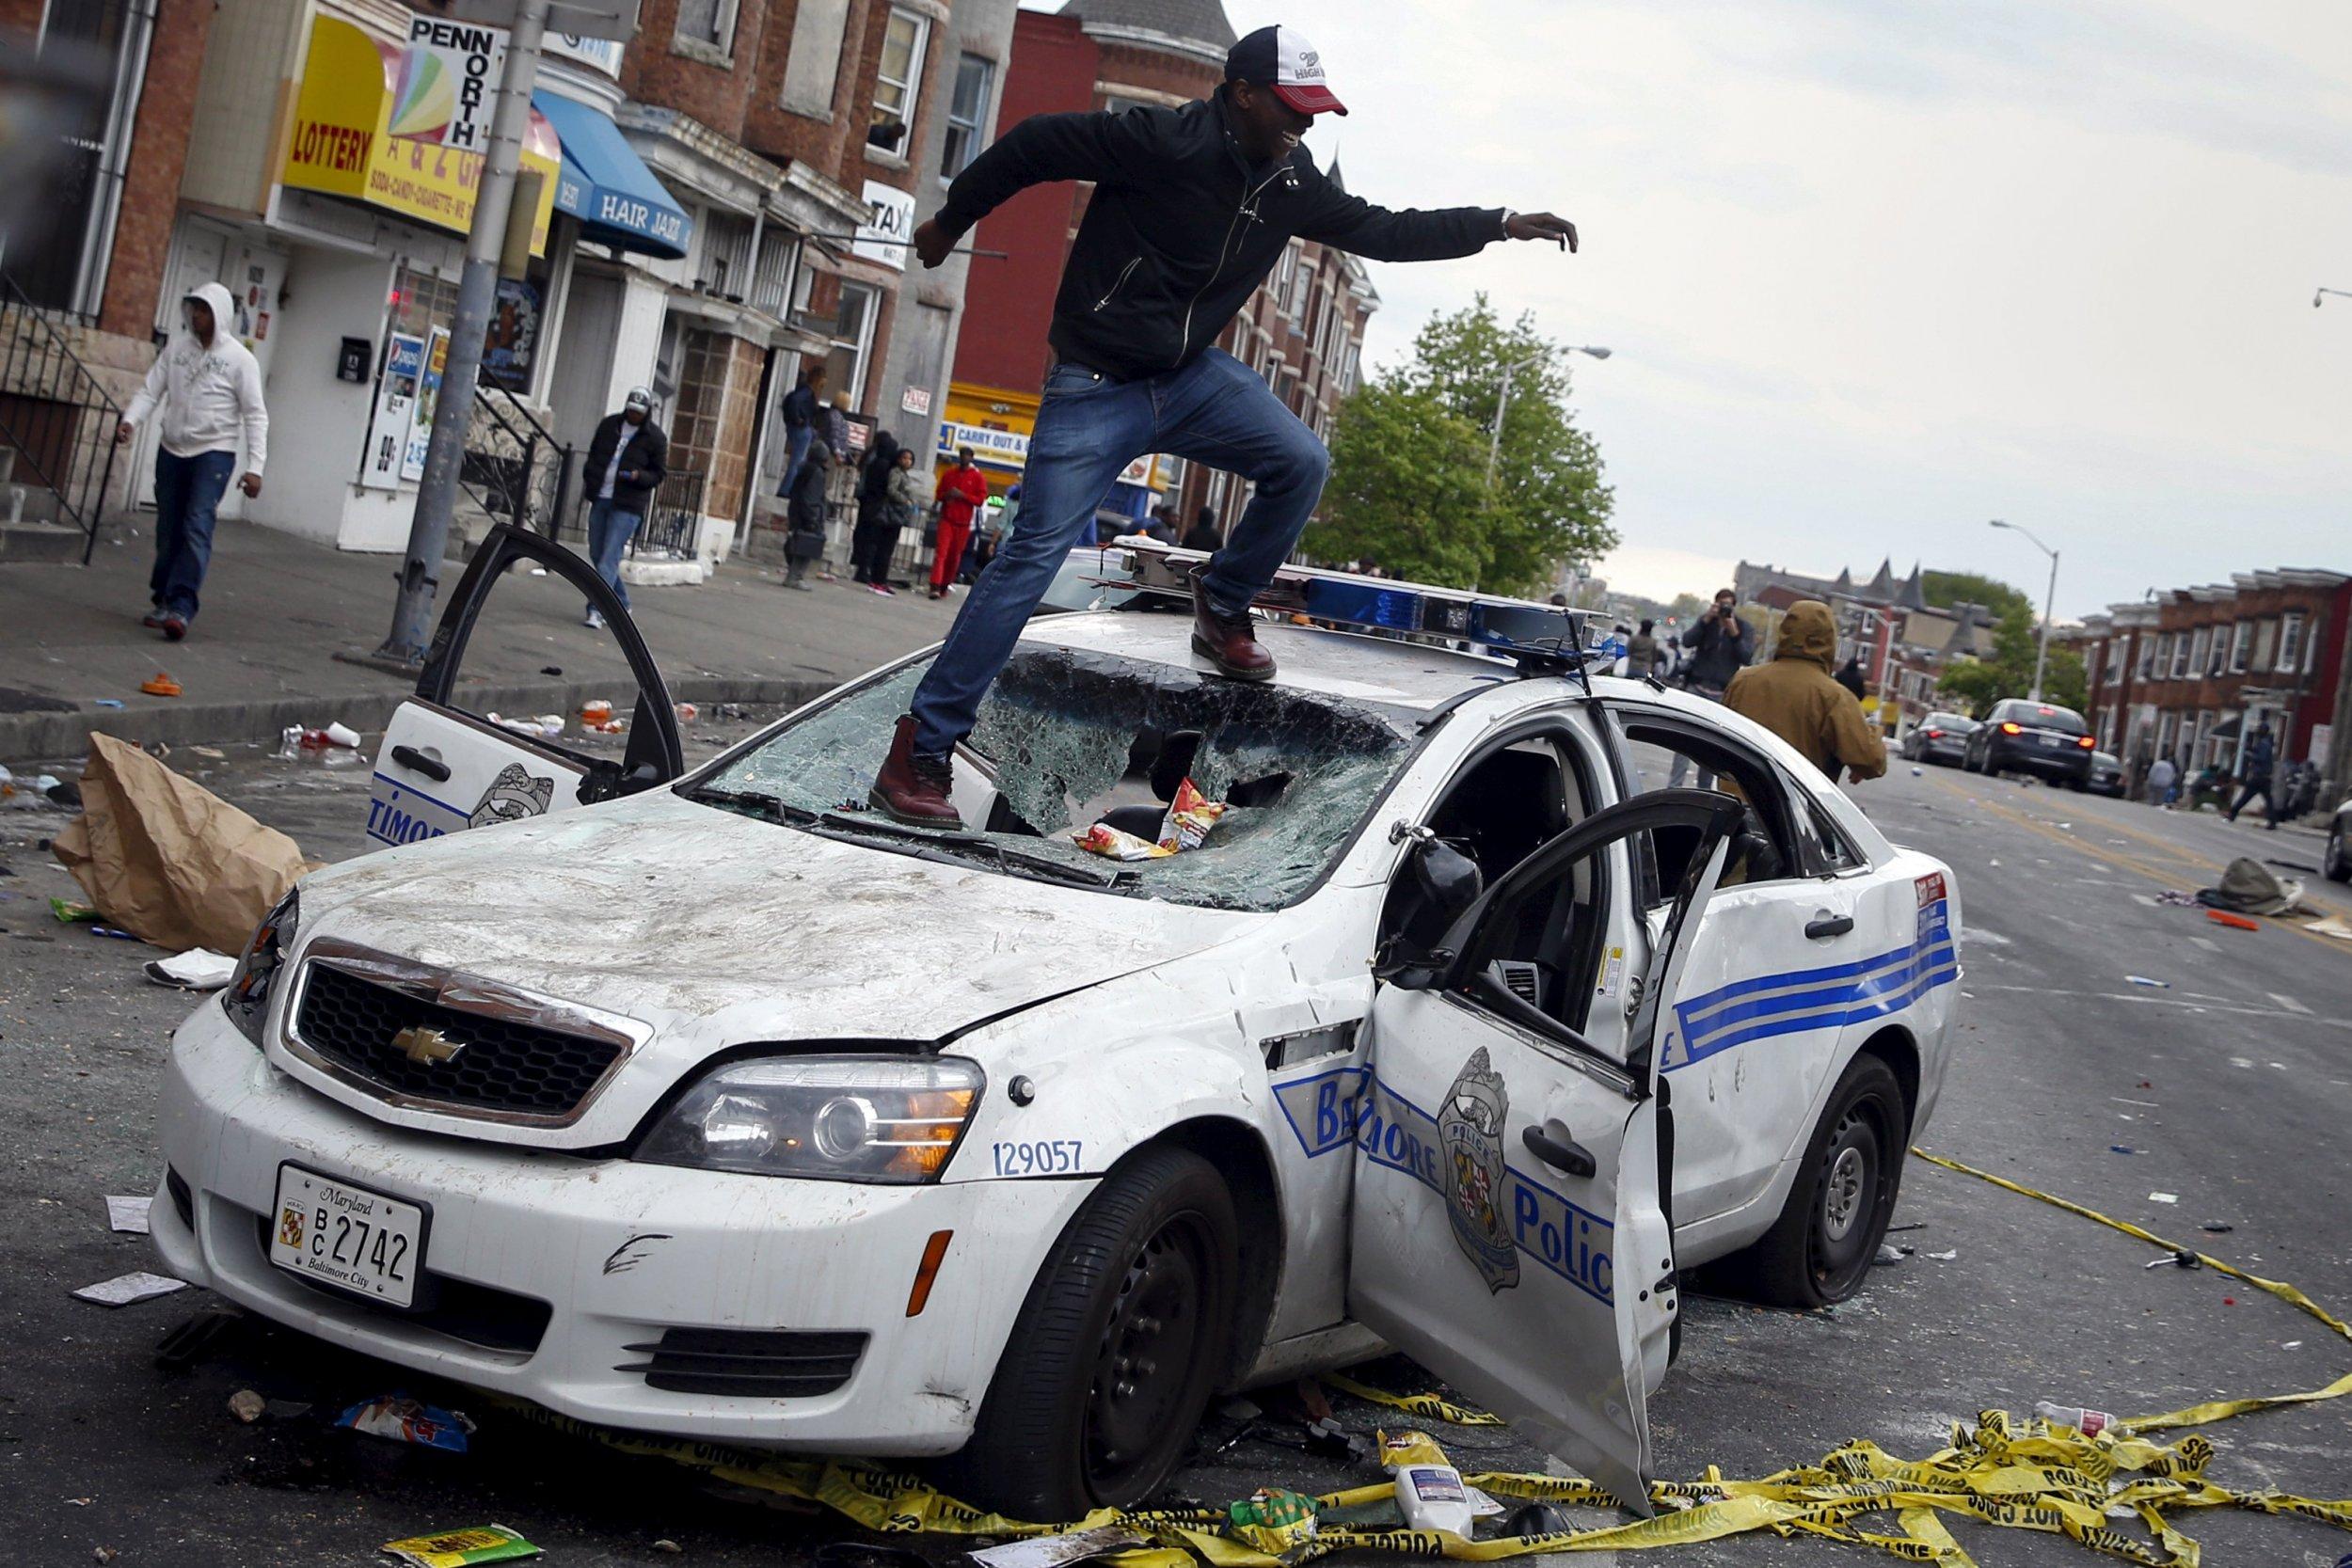 2015-04-27T230835Z_48661891_GF10000075321_RTRMADP_3_USA-POLICE-BALTIMORE